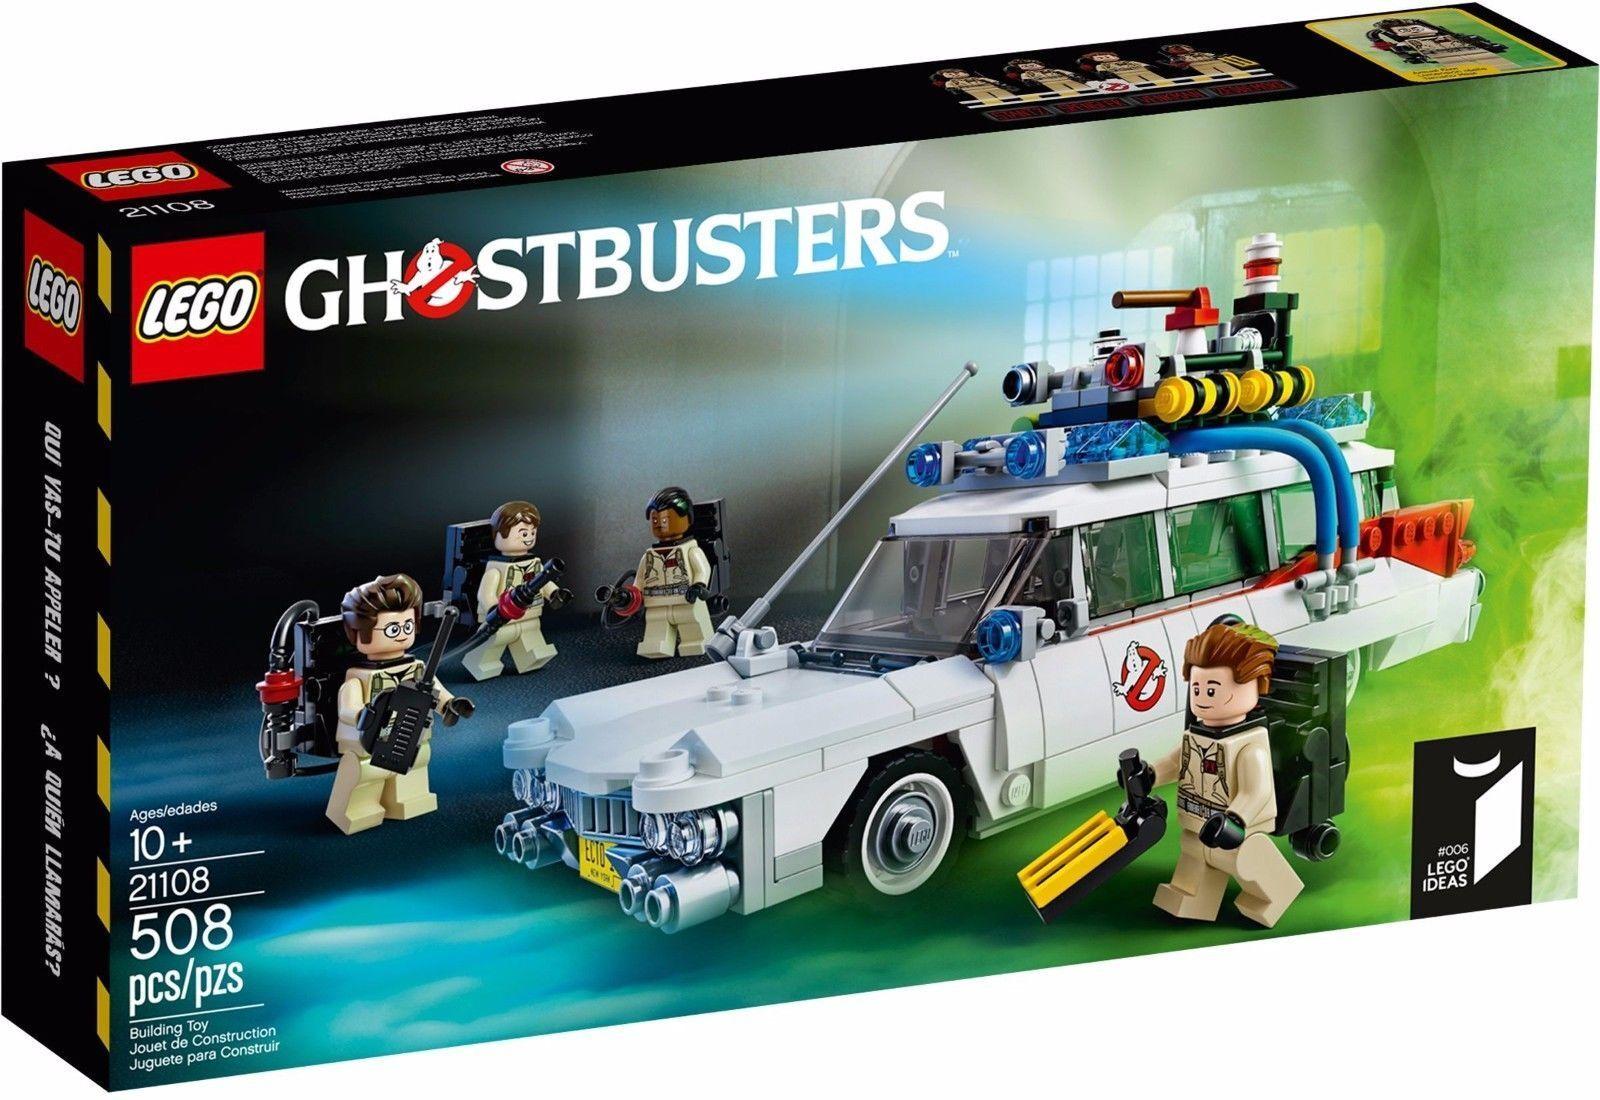 Lego 21108 Ideas - Ghostbusters Ecto-1 Boite Neuve Scellée